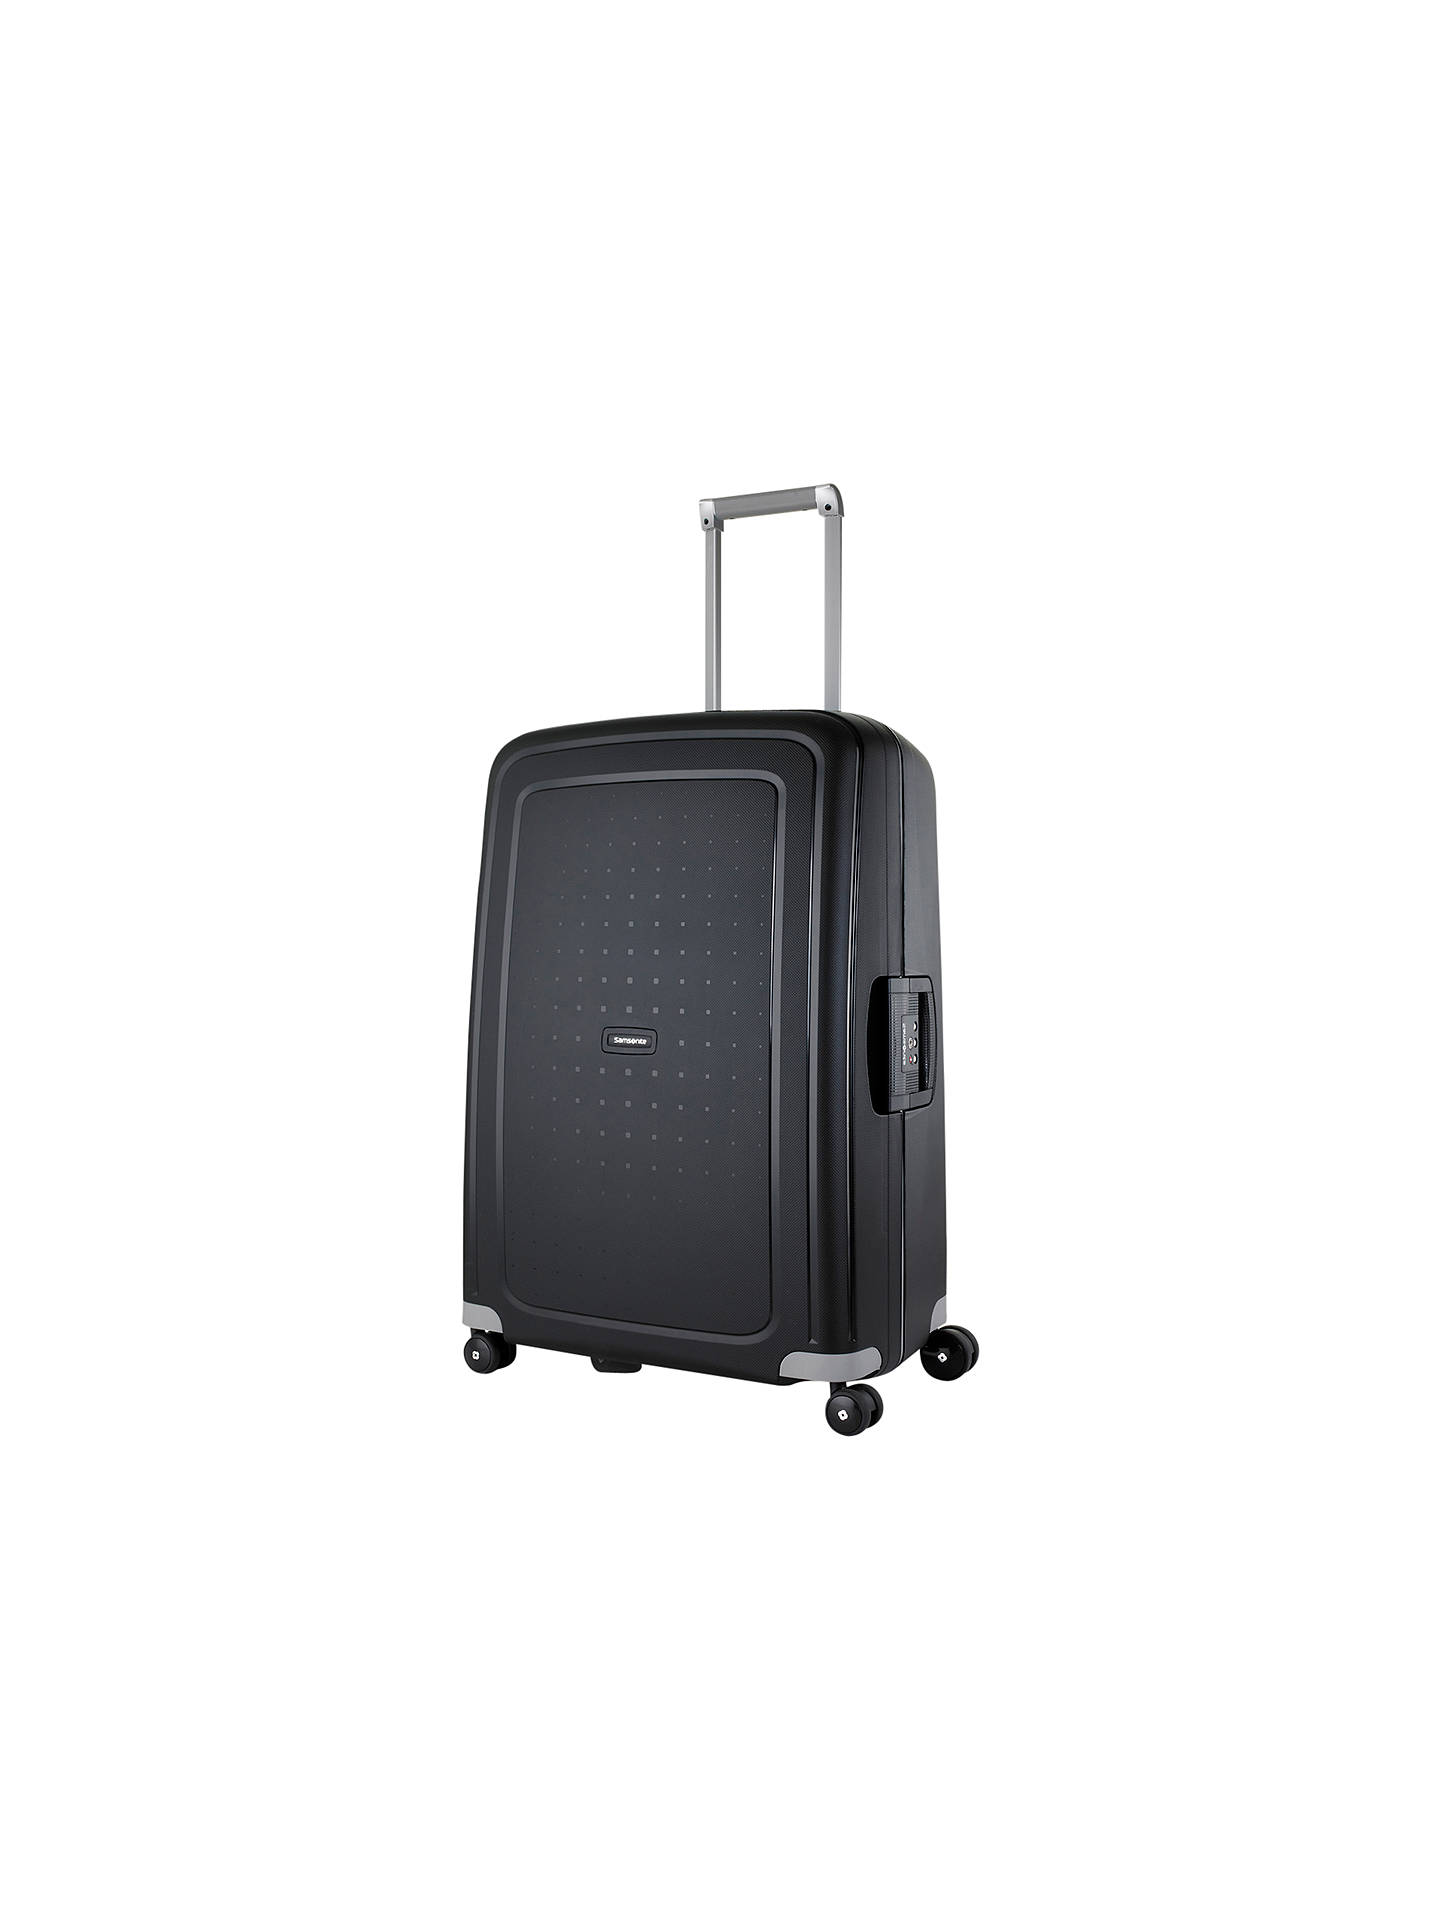 ce68615db00 Buy Samsonite S-Cure 4-Wheel 69cm Medium Suitcase, Black Online at  johnlewis ...